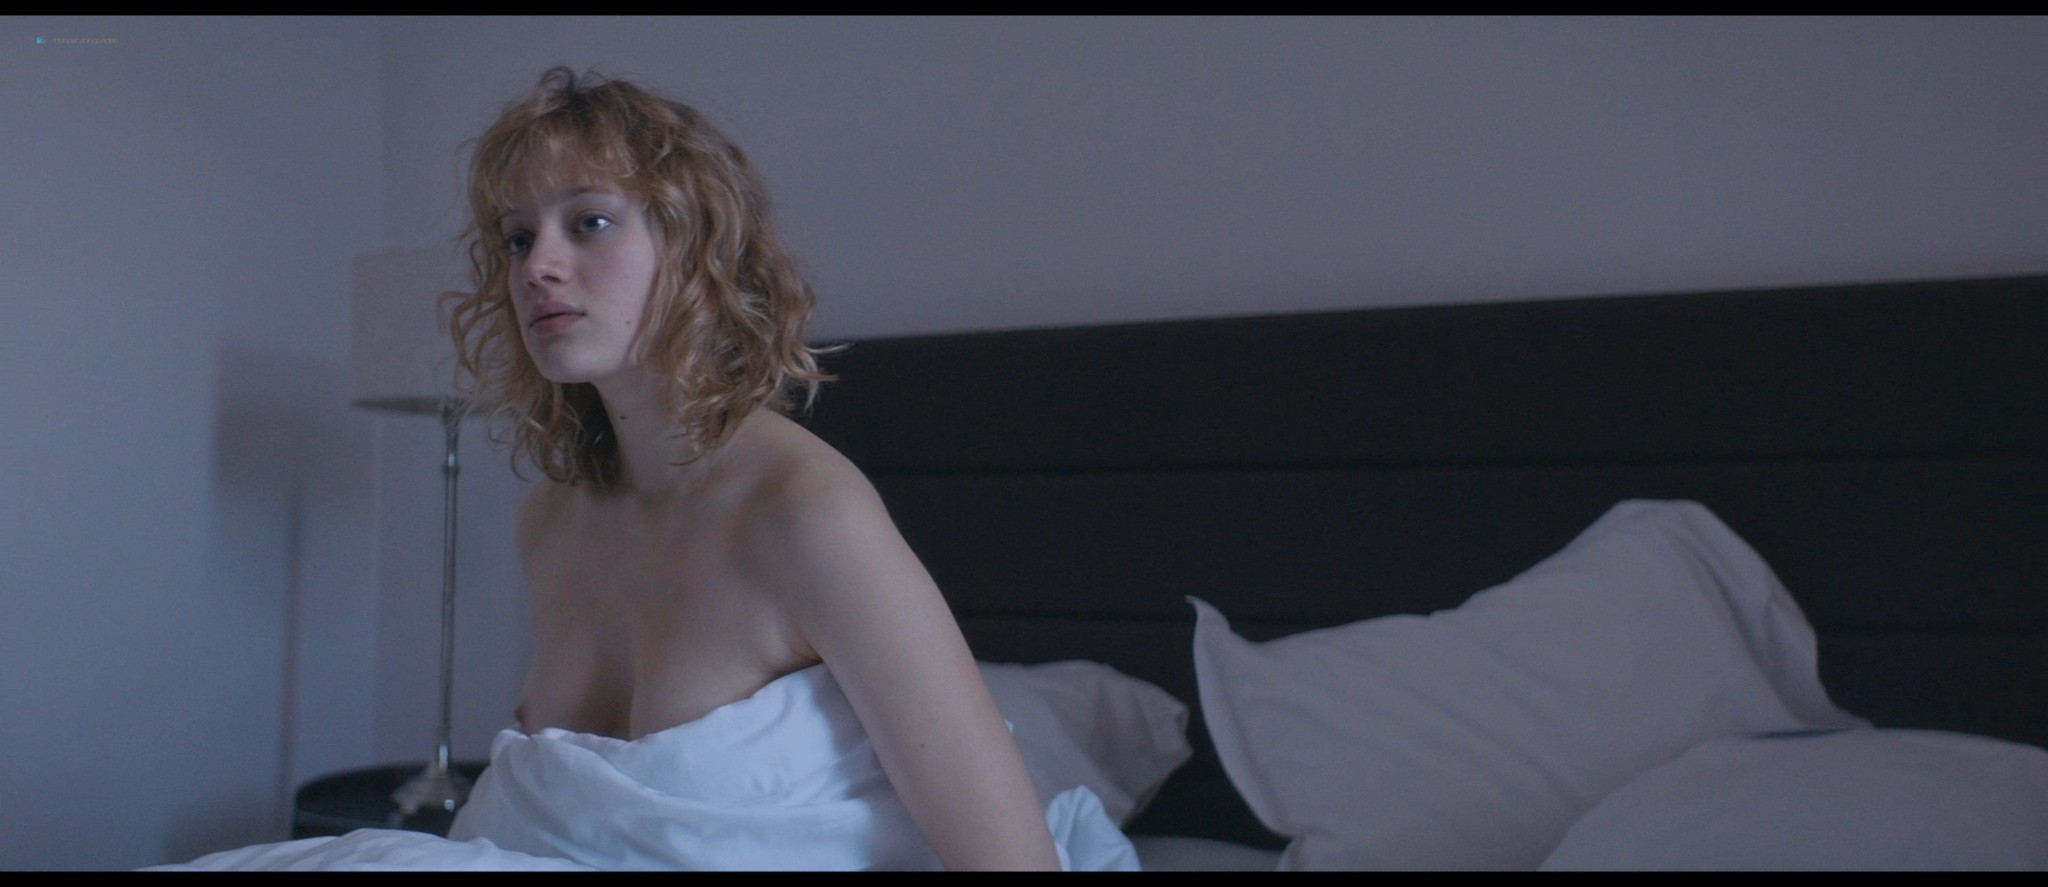 Nadia Tereszkiewicz nude lesbian sex with Valeria Bruni Tedeschi - Seules les bêtes (FR-2019) HD 1080p BluRay (5)